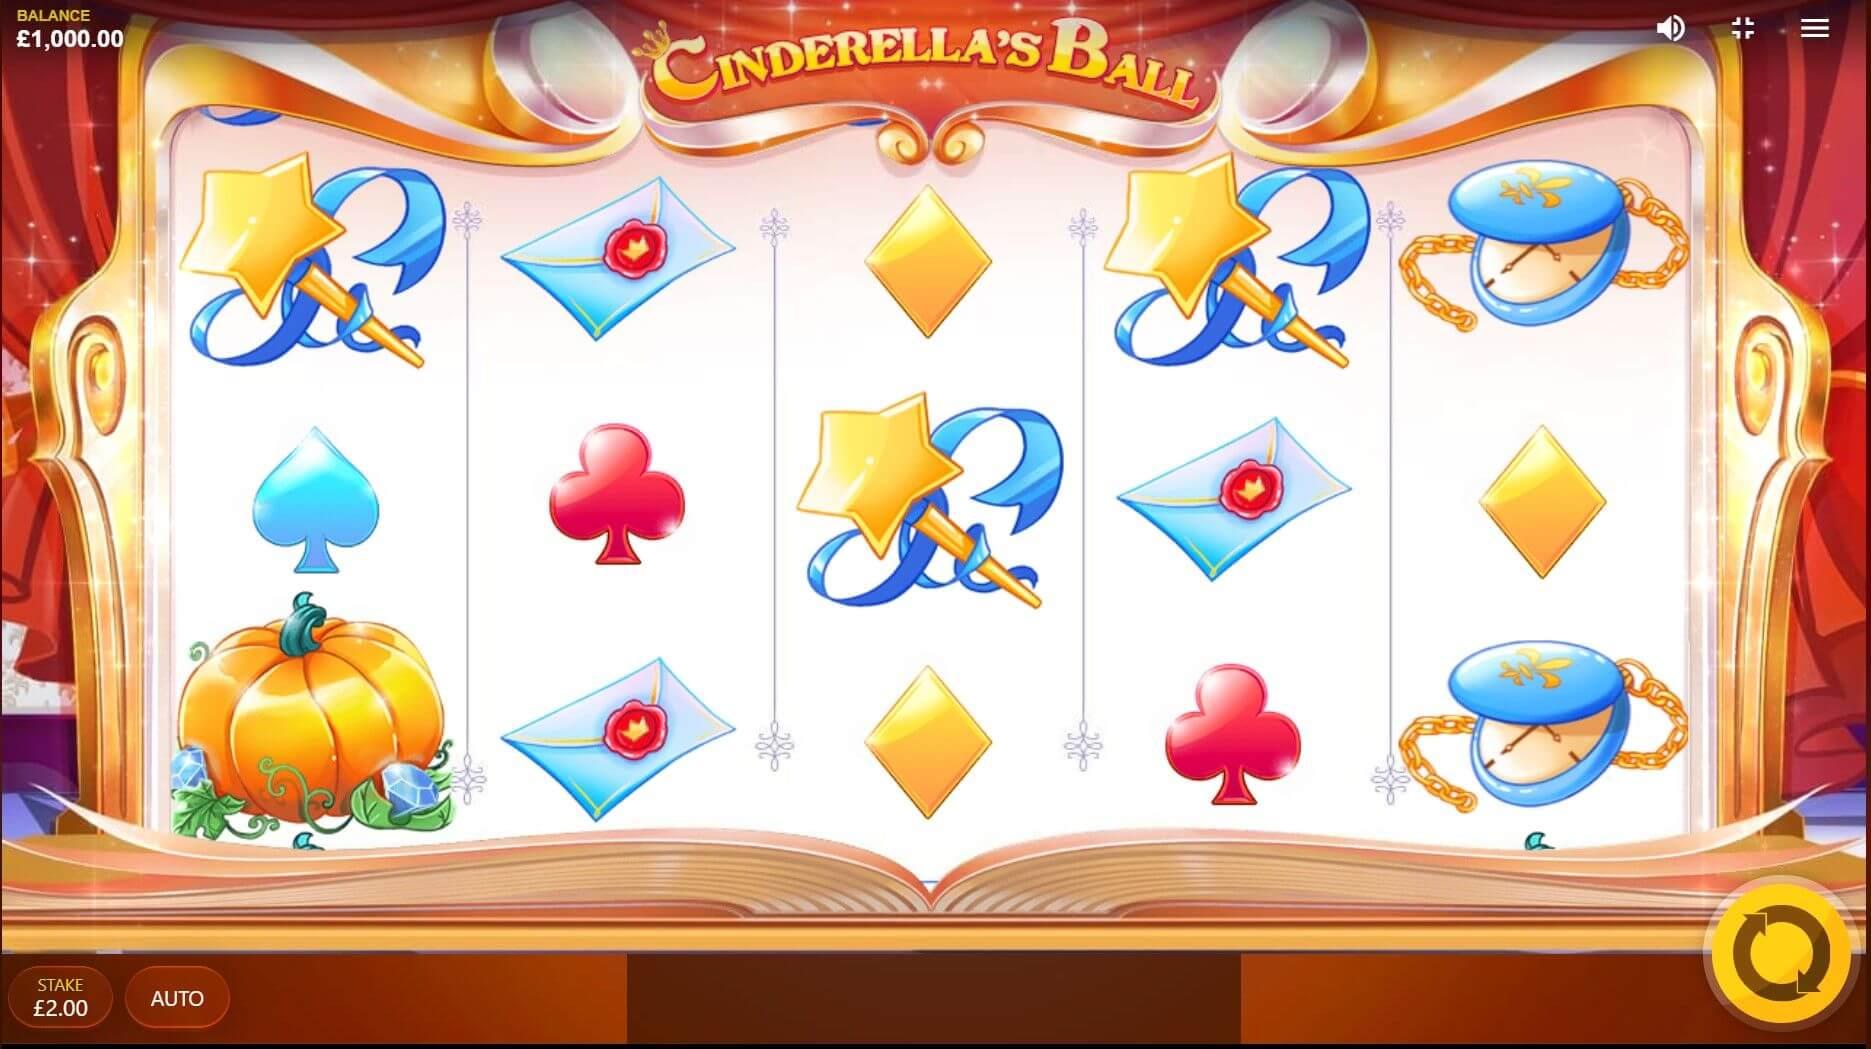 Cinderella's Ball Slot Gameplay